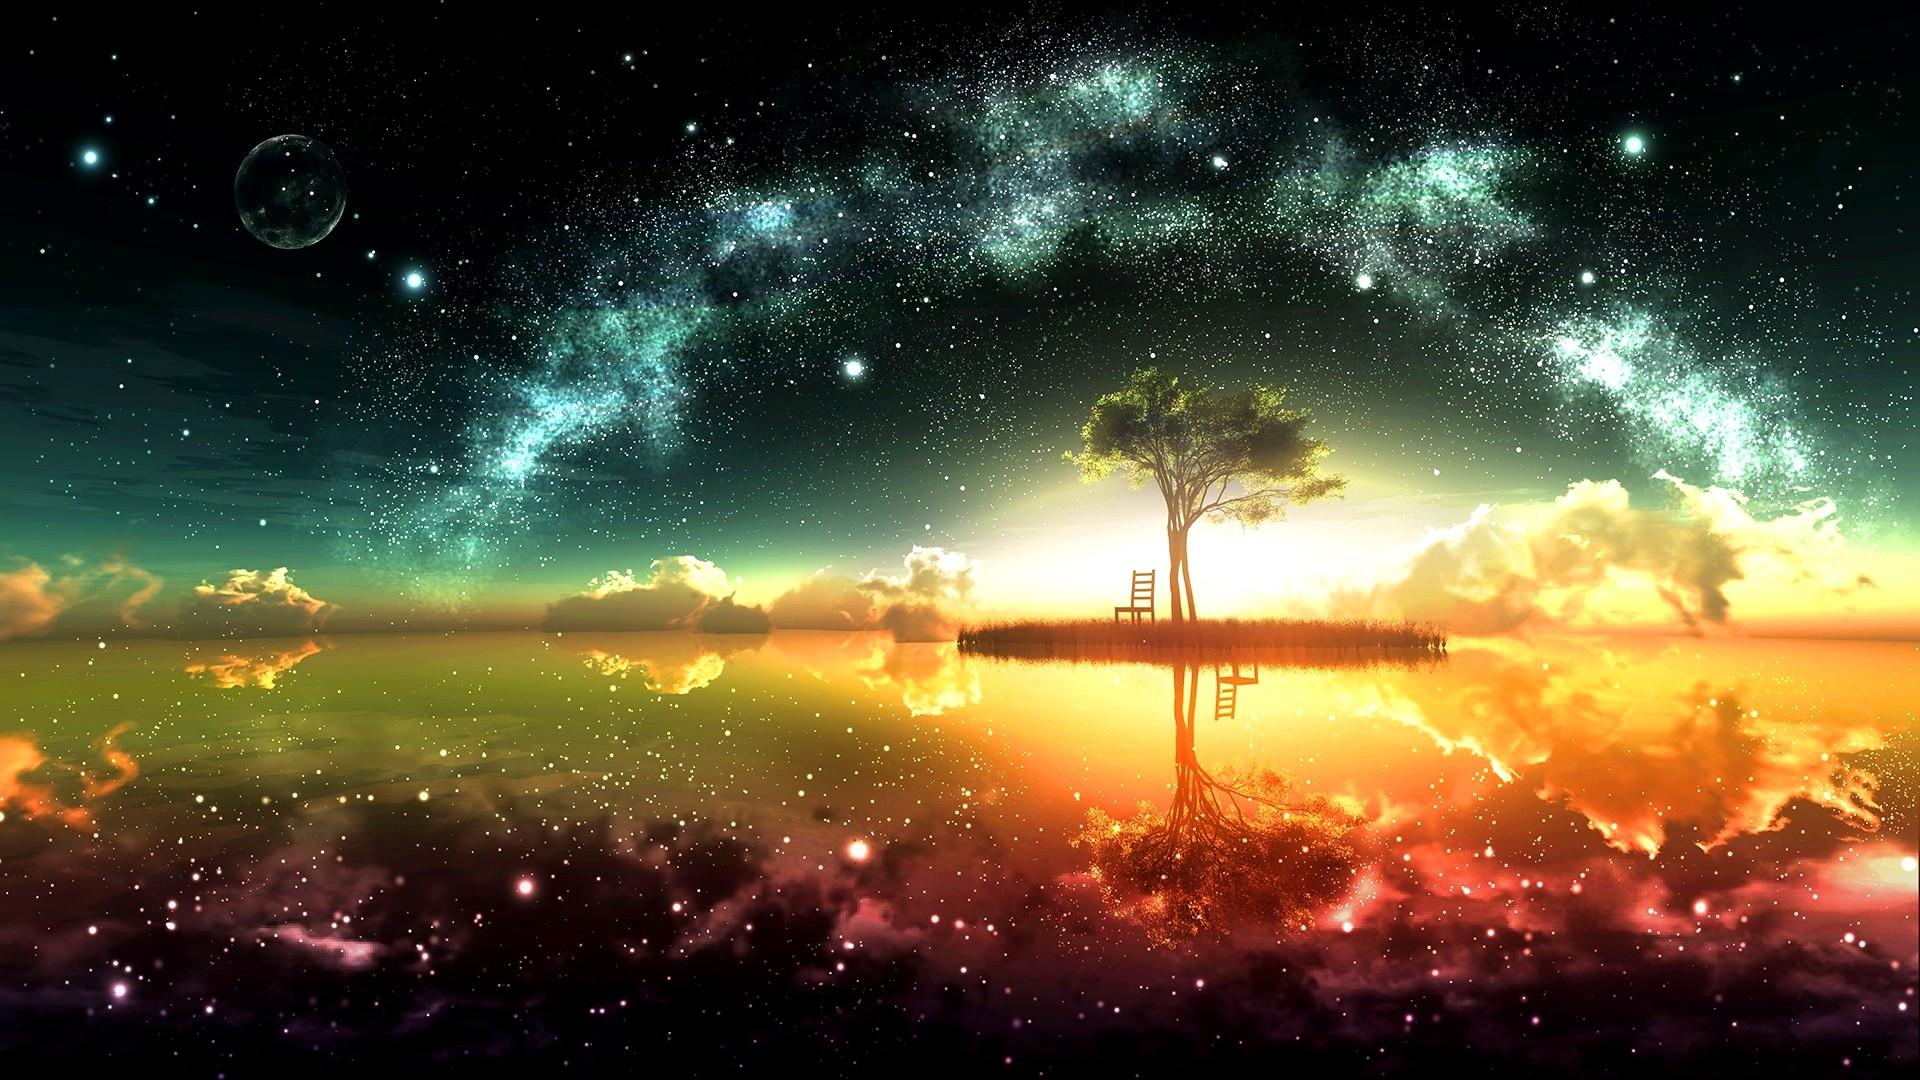 surreal space wallpaper hd